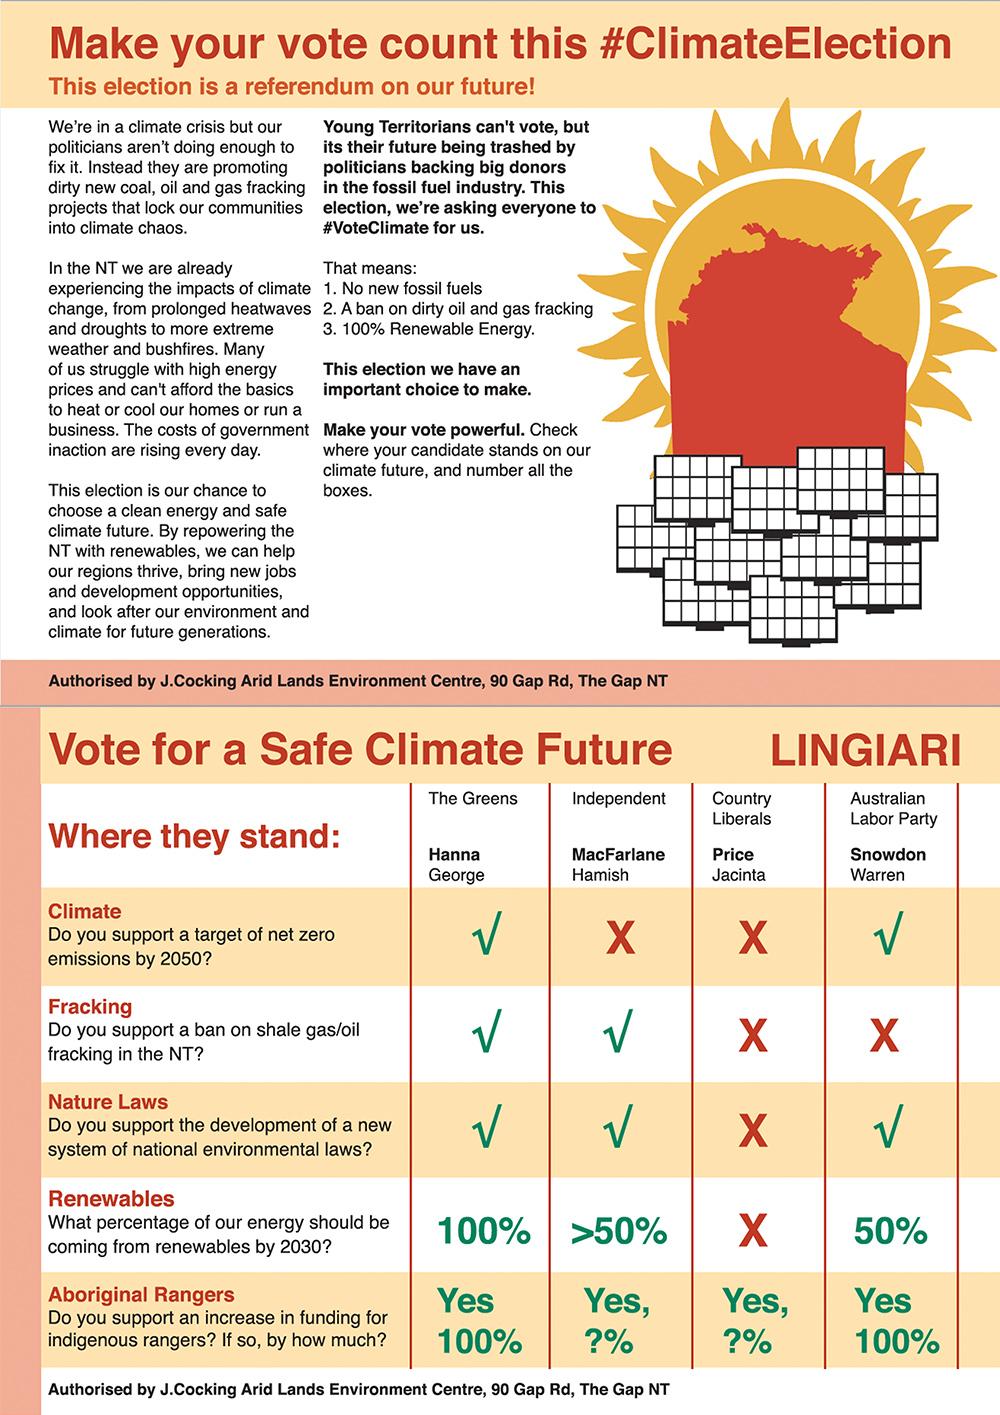 Climate_Election_Scorecard_1000px.jpg